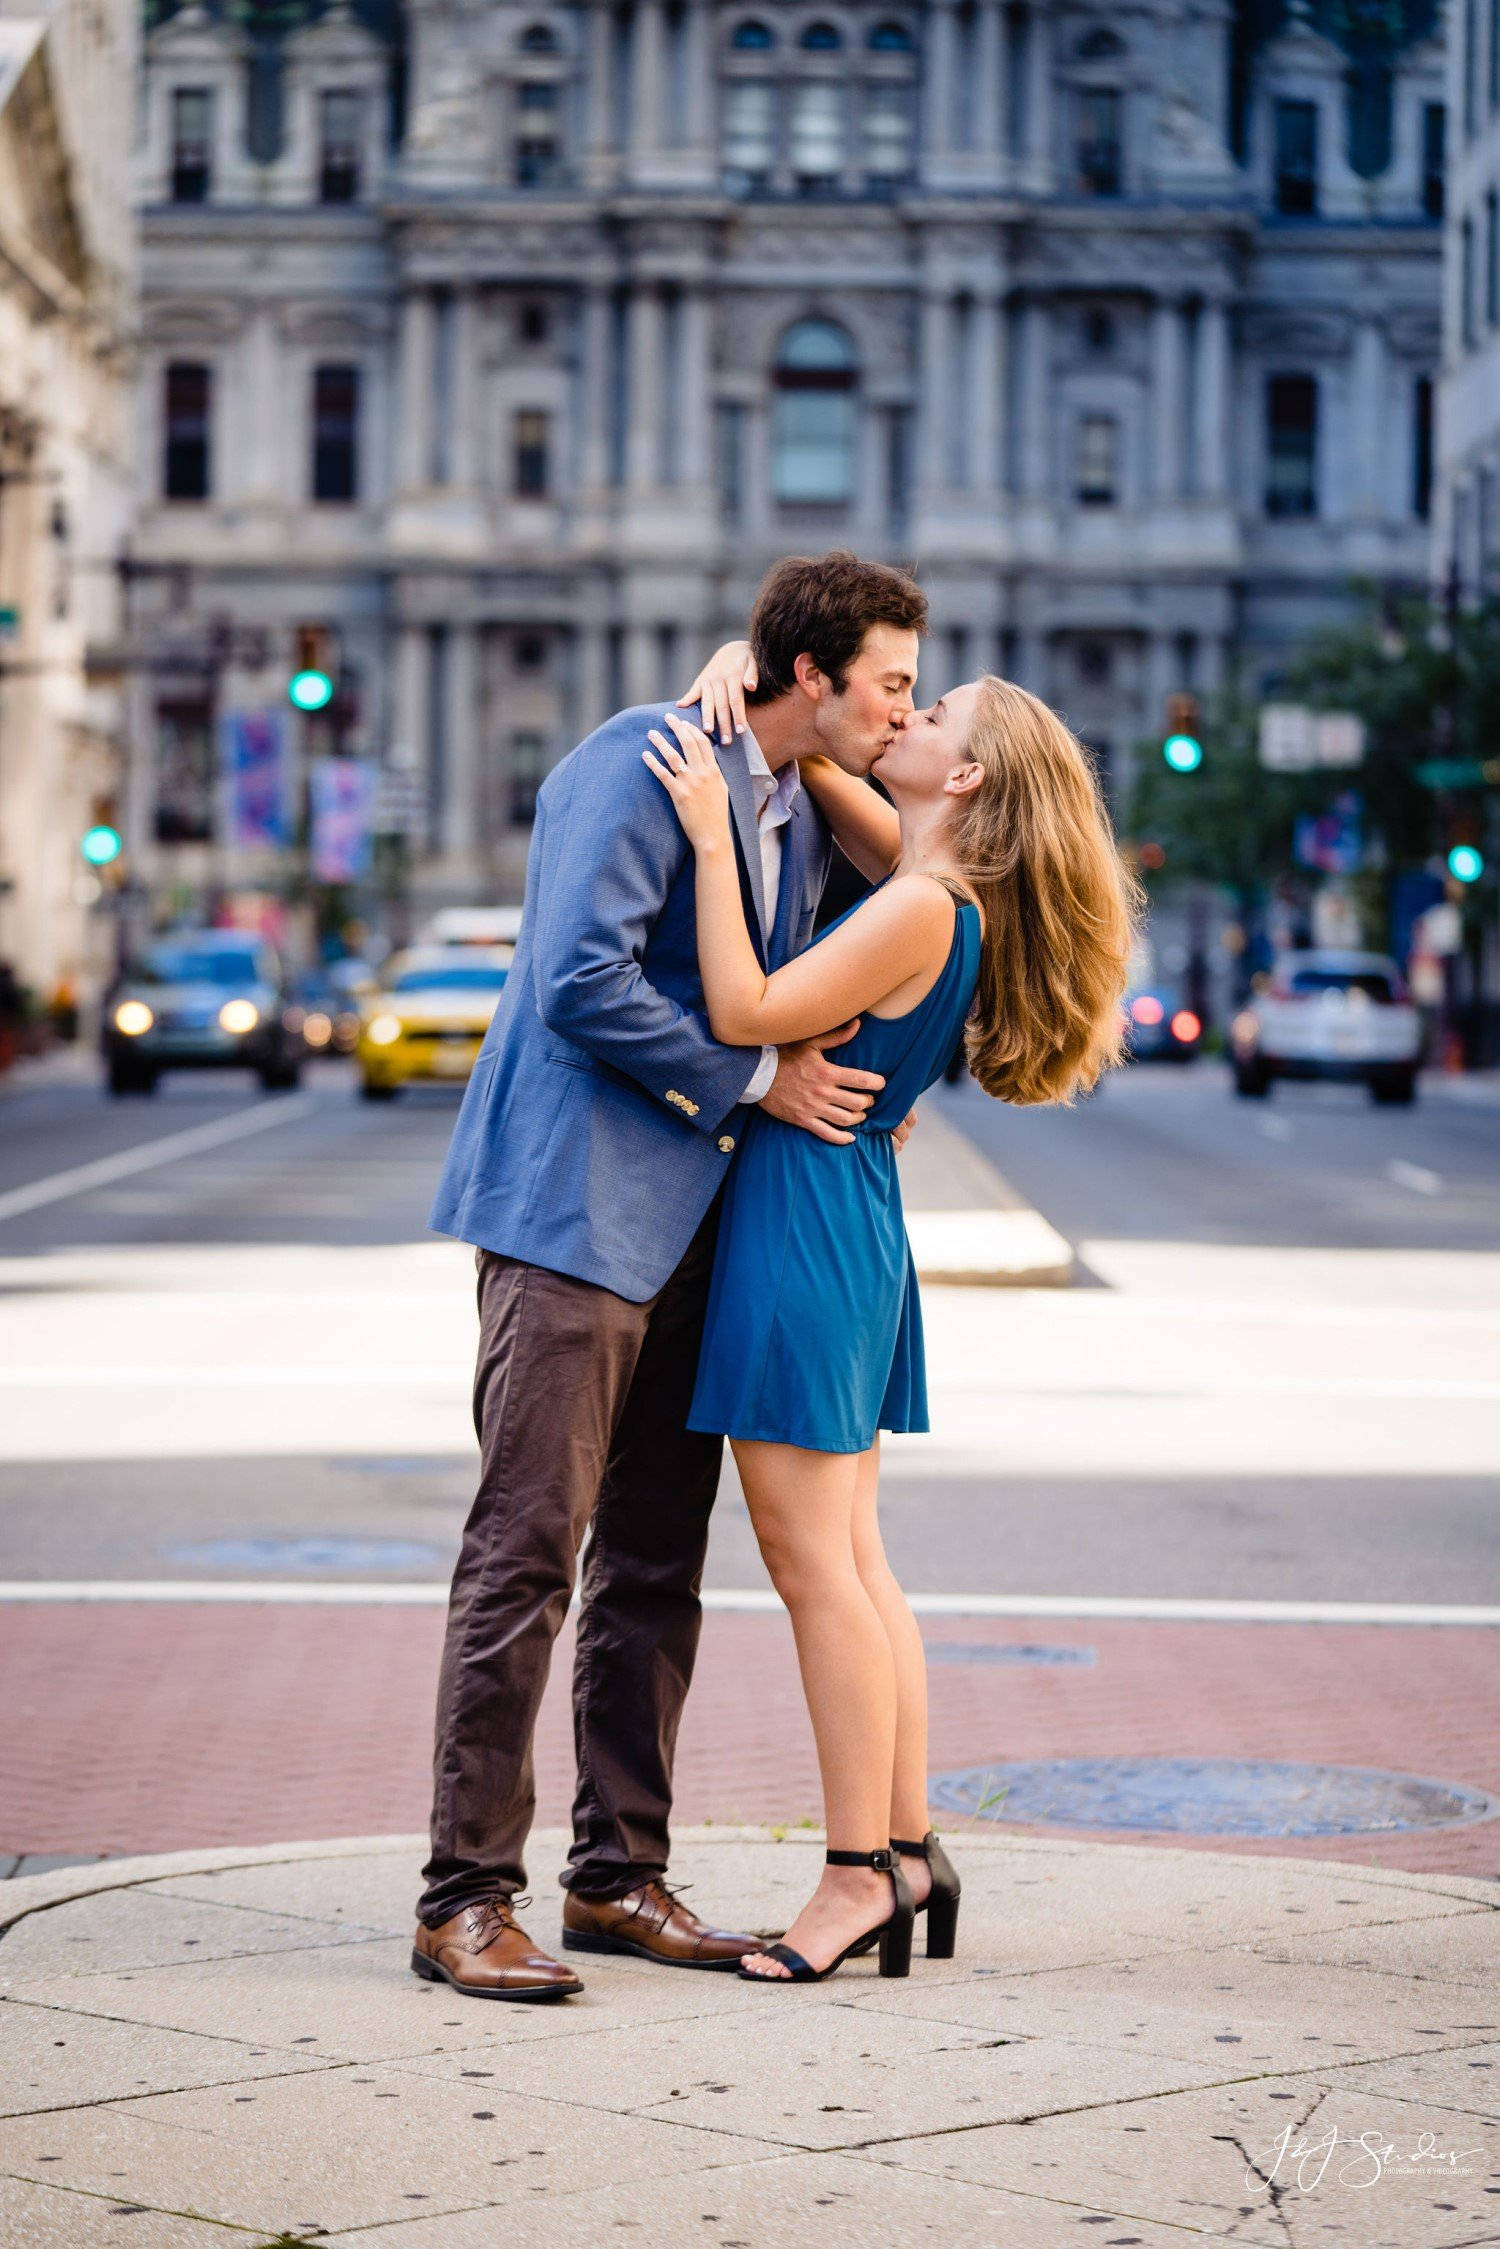 couple kissing girl in blue dress